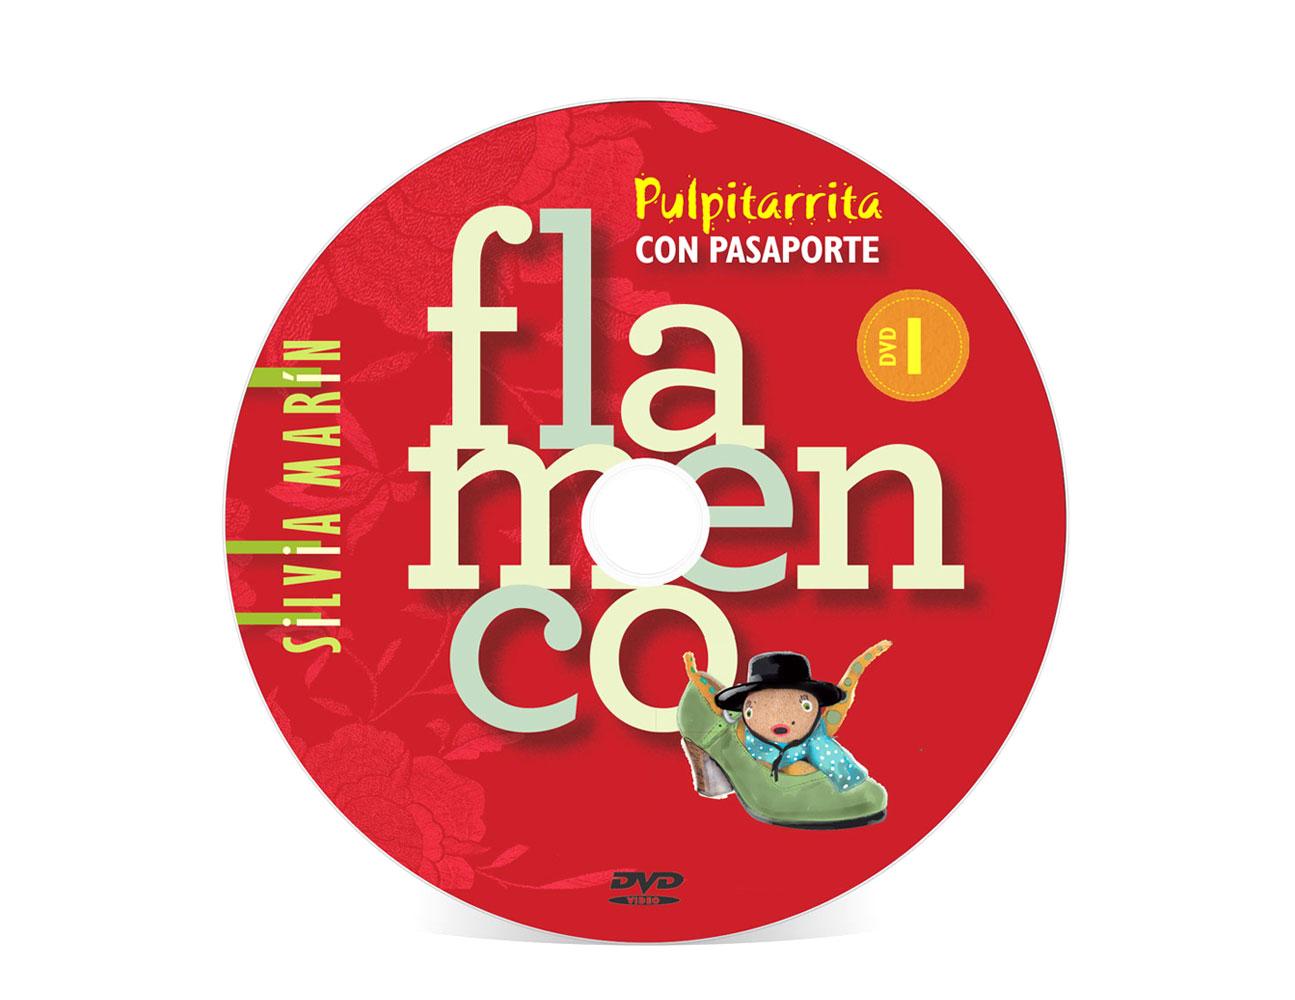 DVD 1 Pulpitarrita con pasaporte flamenco